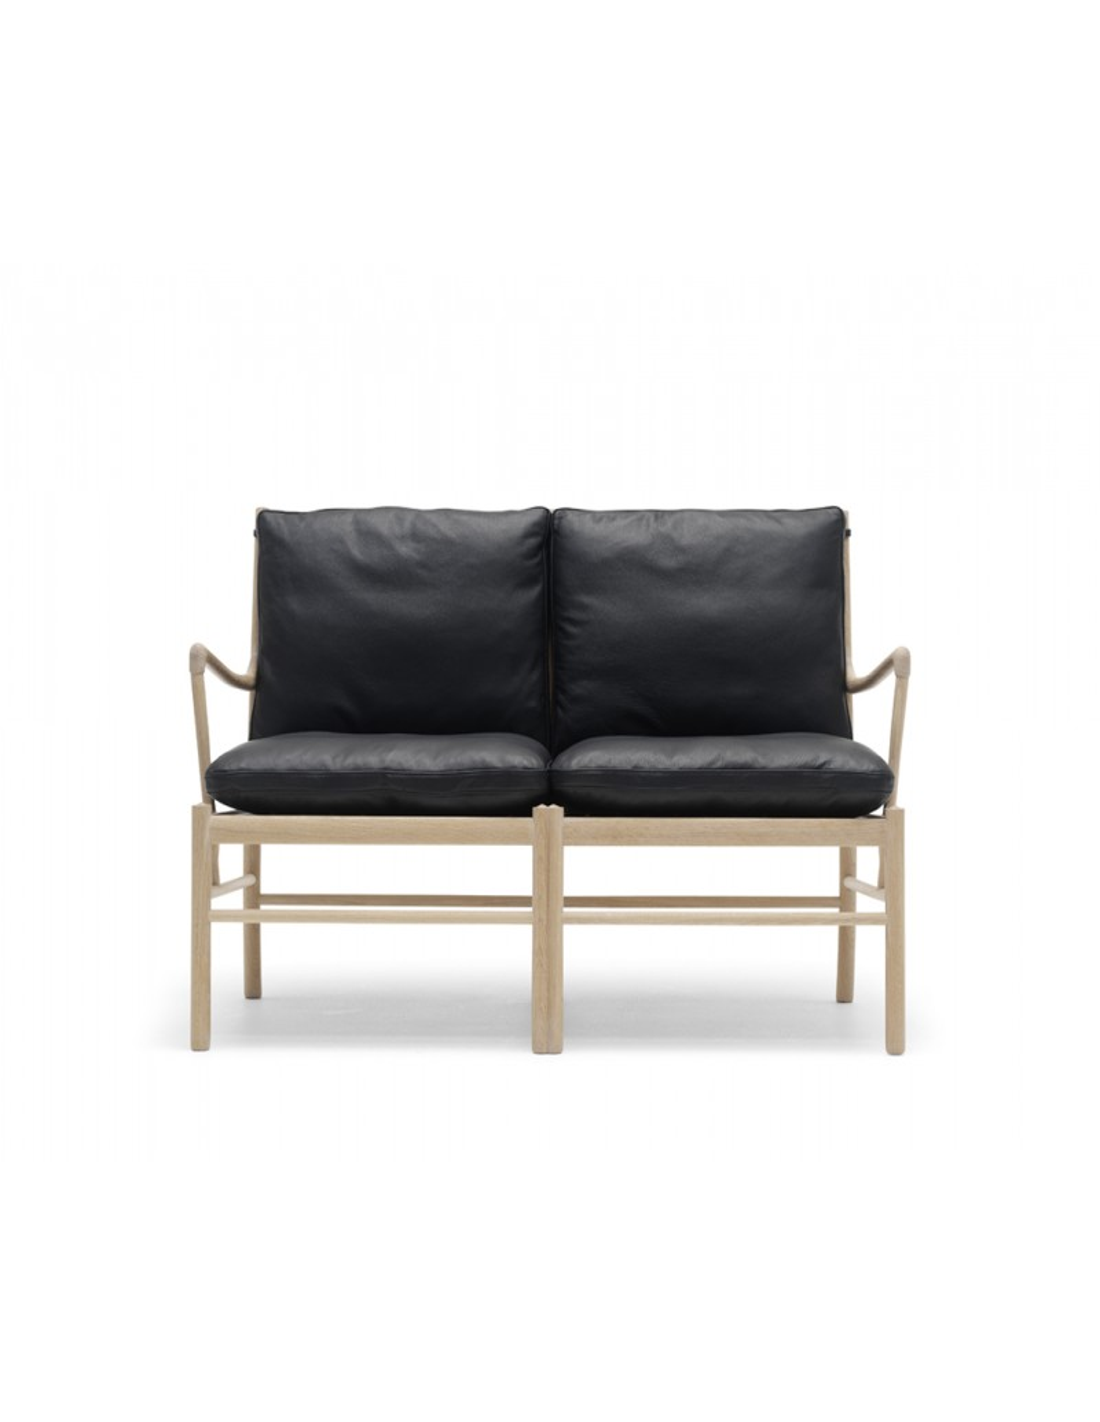 colonial sofa wanscher ole for carl hansen scandinavian design. Black Bedroom Furniture Sets. Home Design Ideas